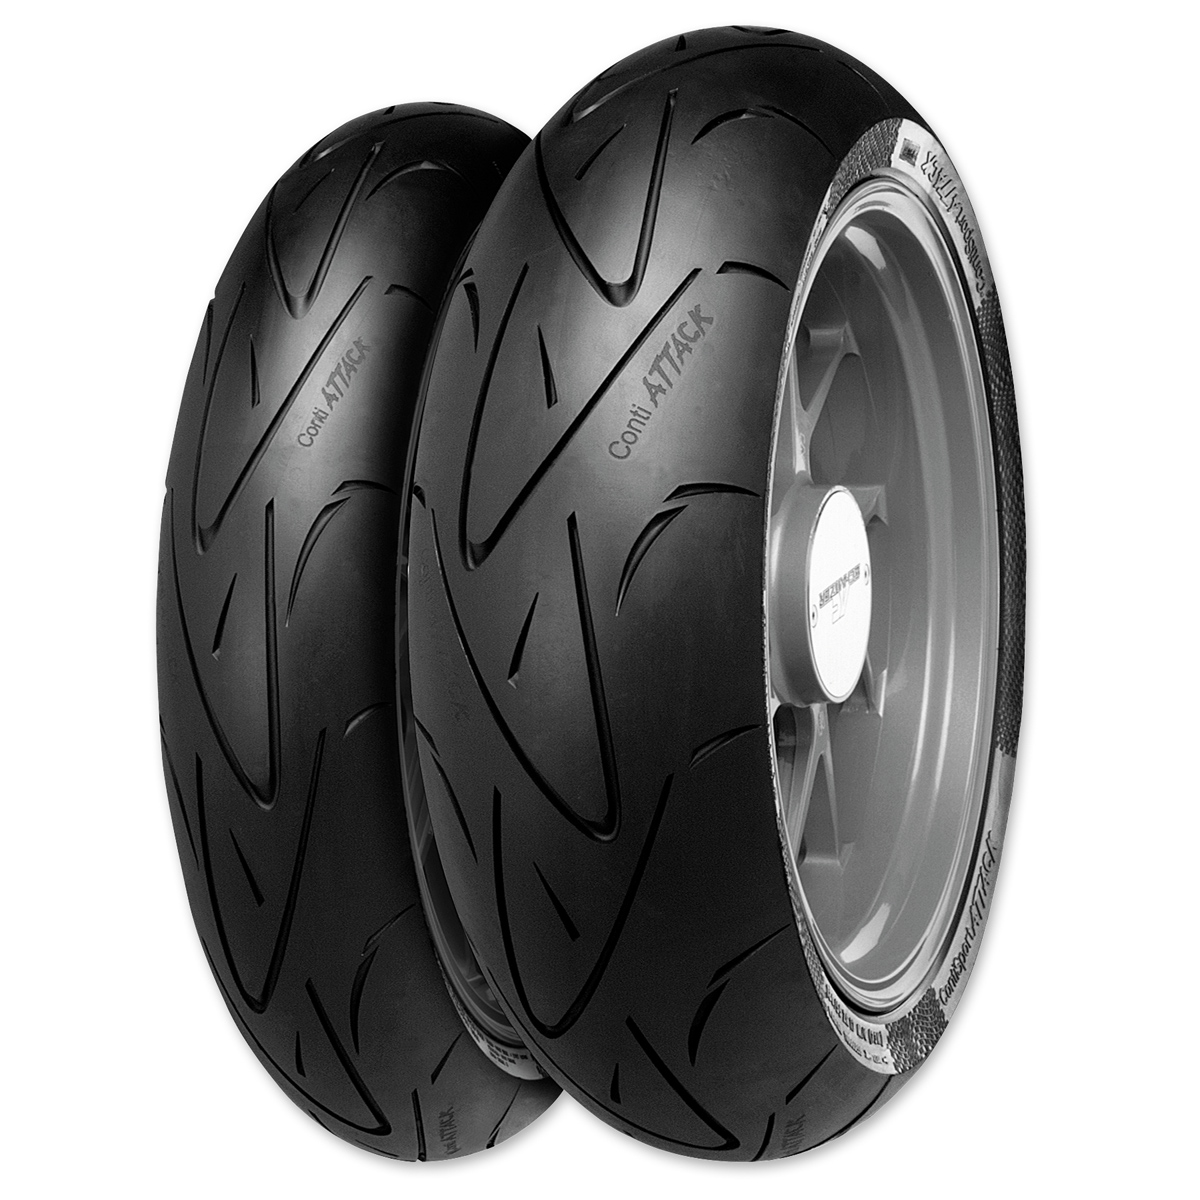 Continental Sport Attack Hypersport Radial 180/55ZR17 Rear Tire